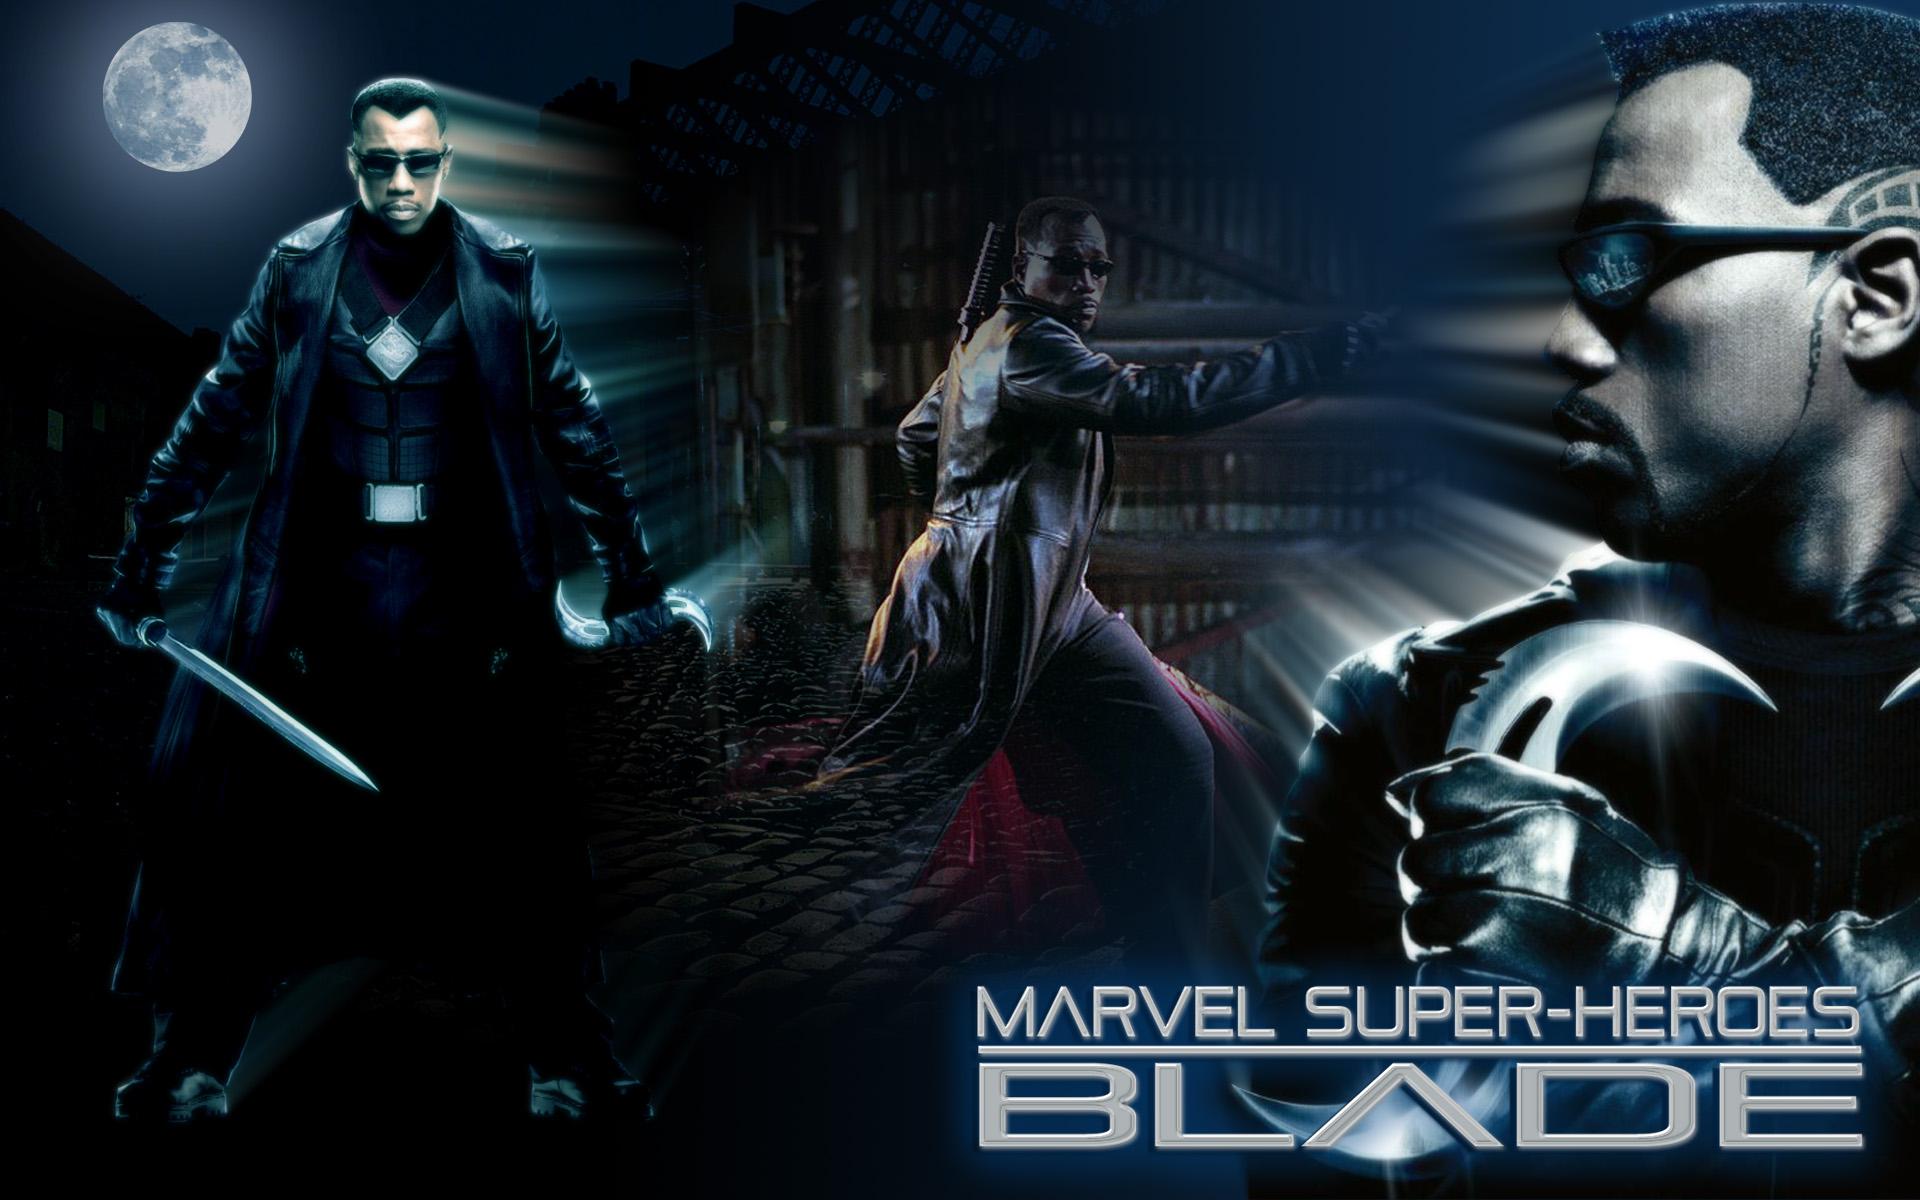 marvel super heroes blade wallpaper 1920x1200